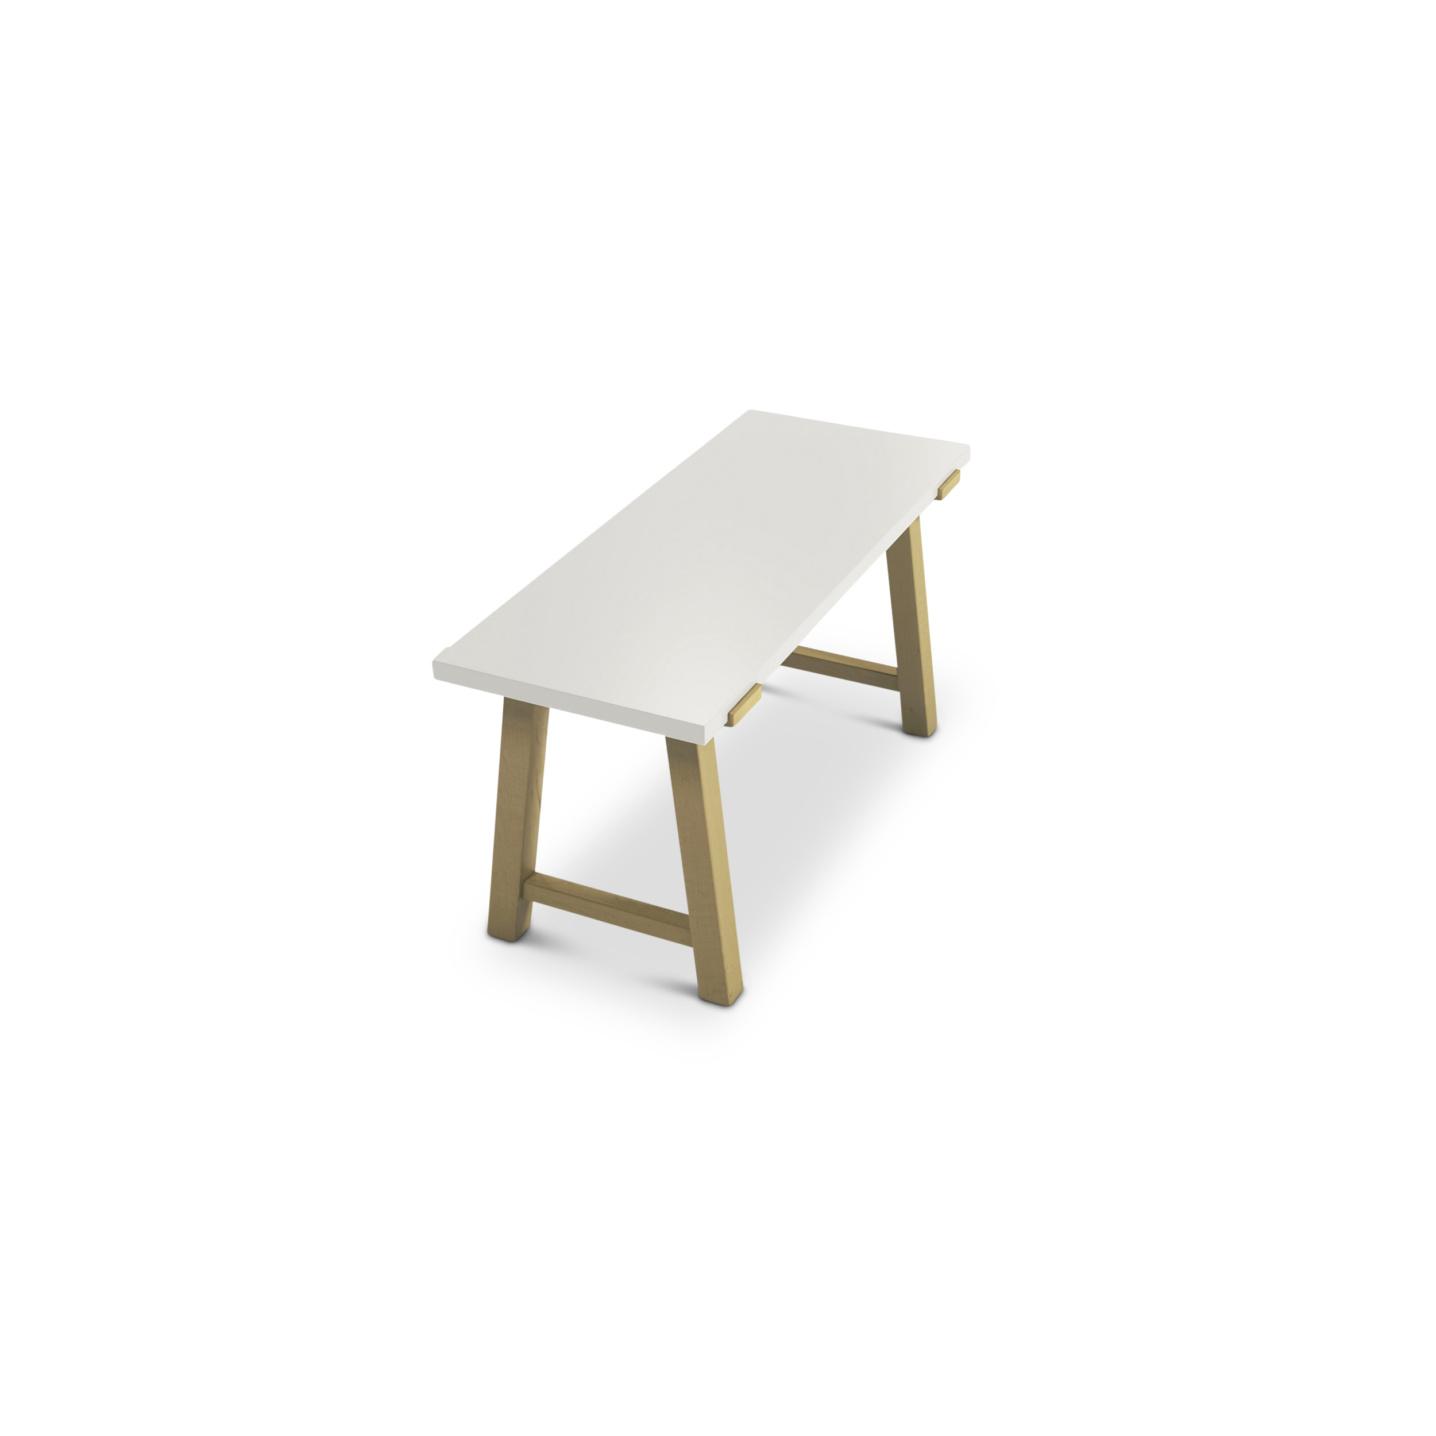 Maple tailored desk